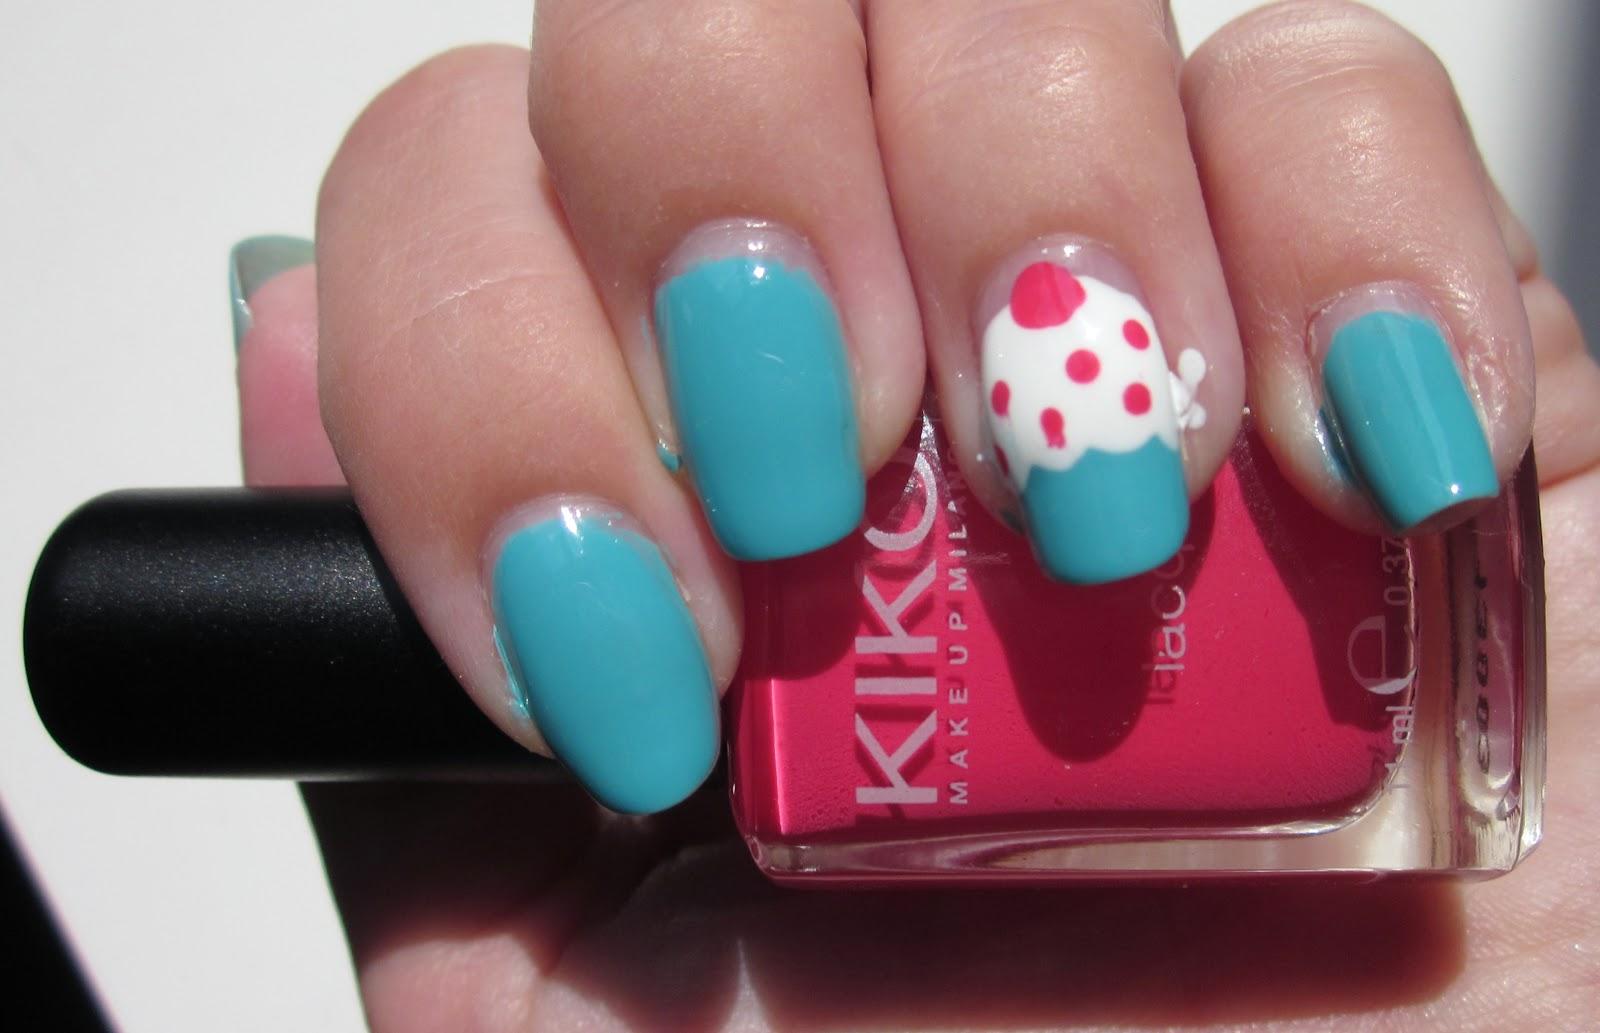 Rose bonbon d butante en nail art d butante en cuisine mon jolie cupcake gr ce a kiko - Nail art debutant ...